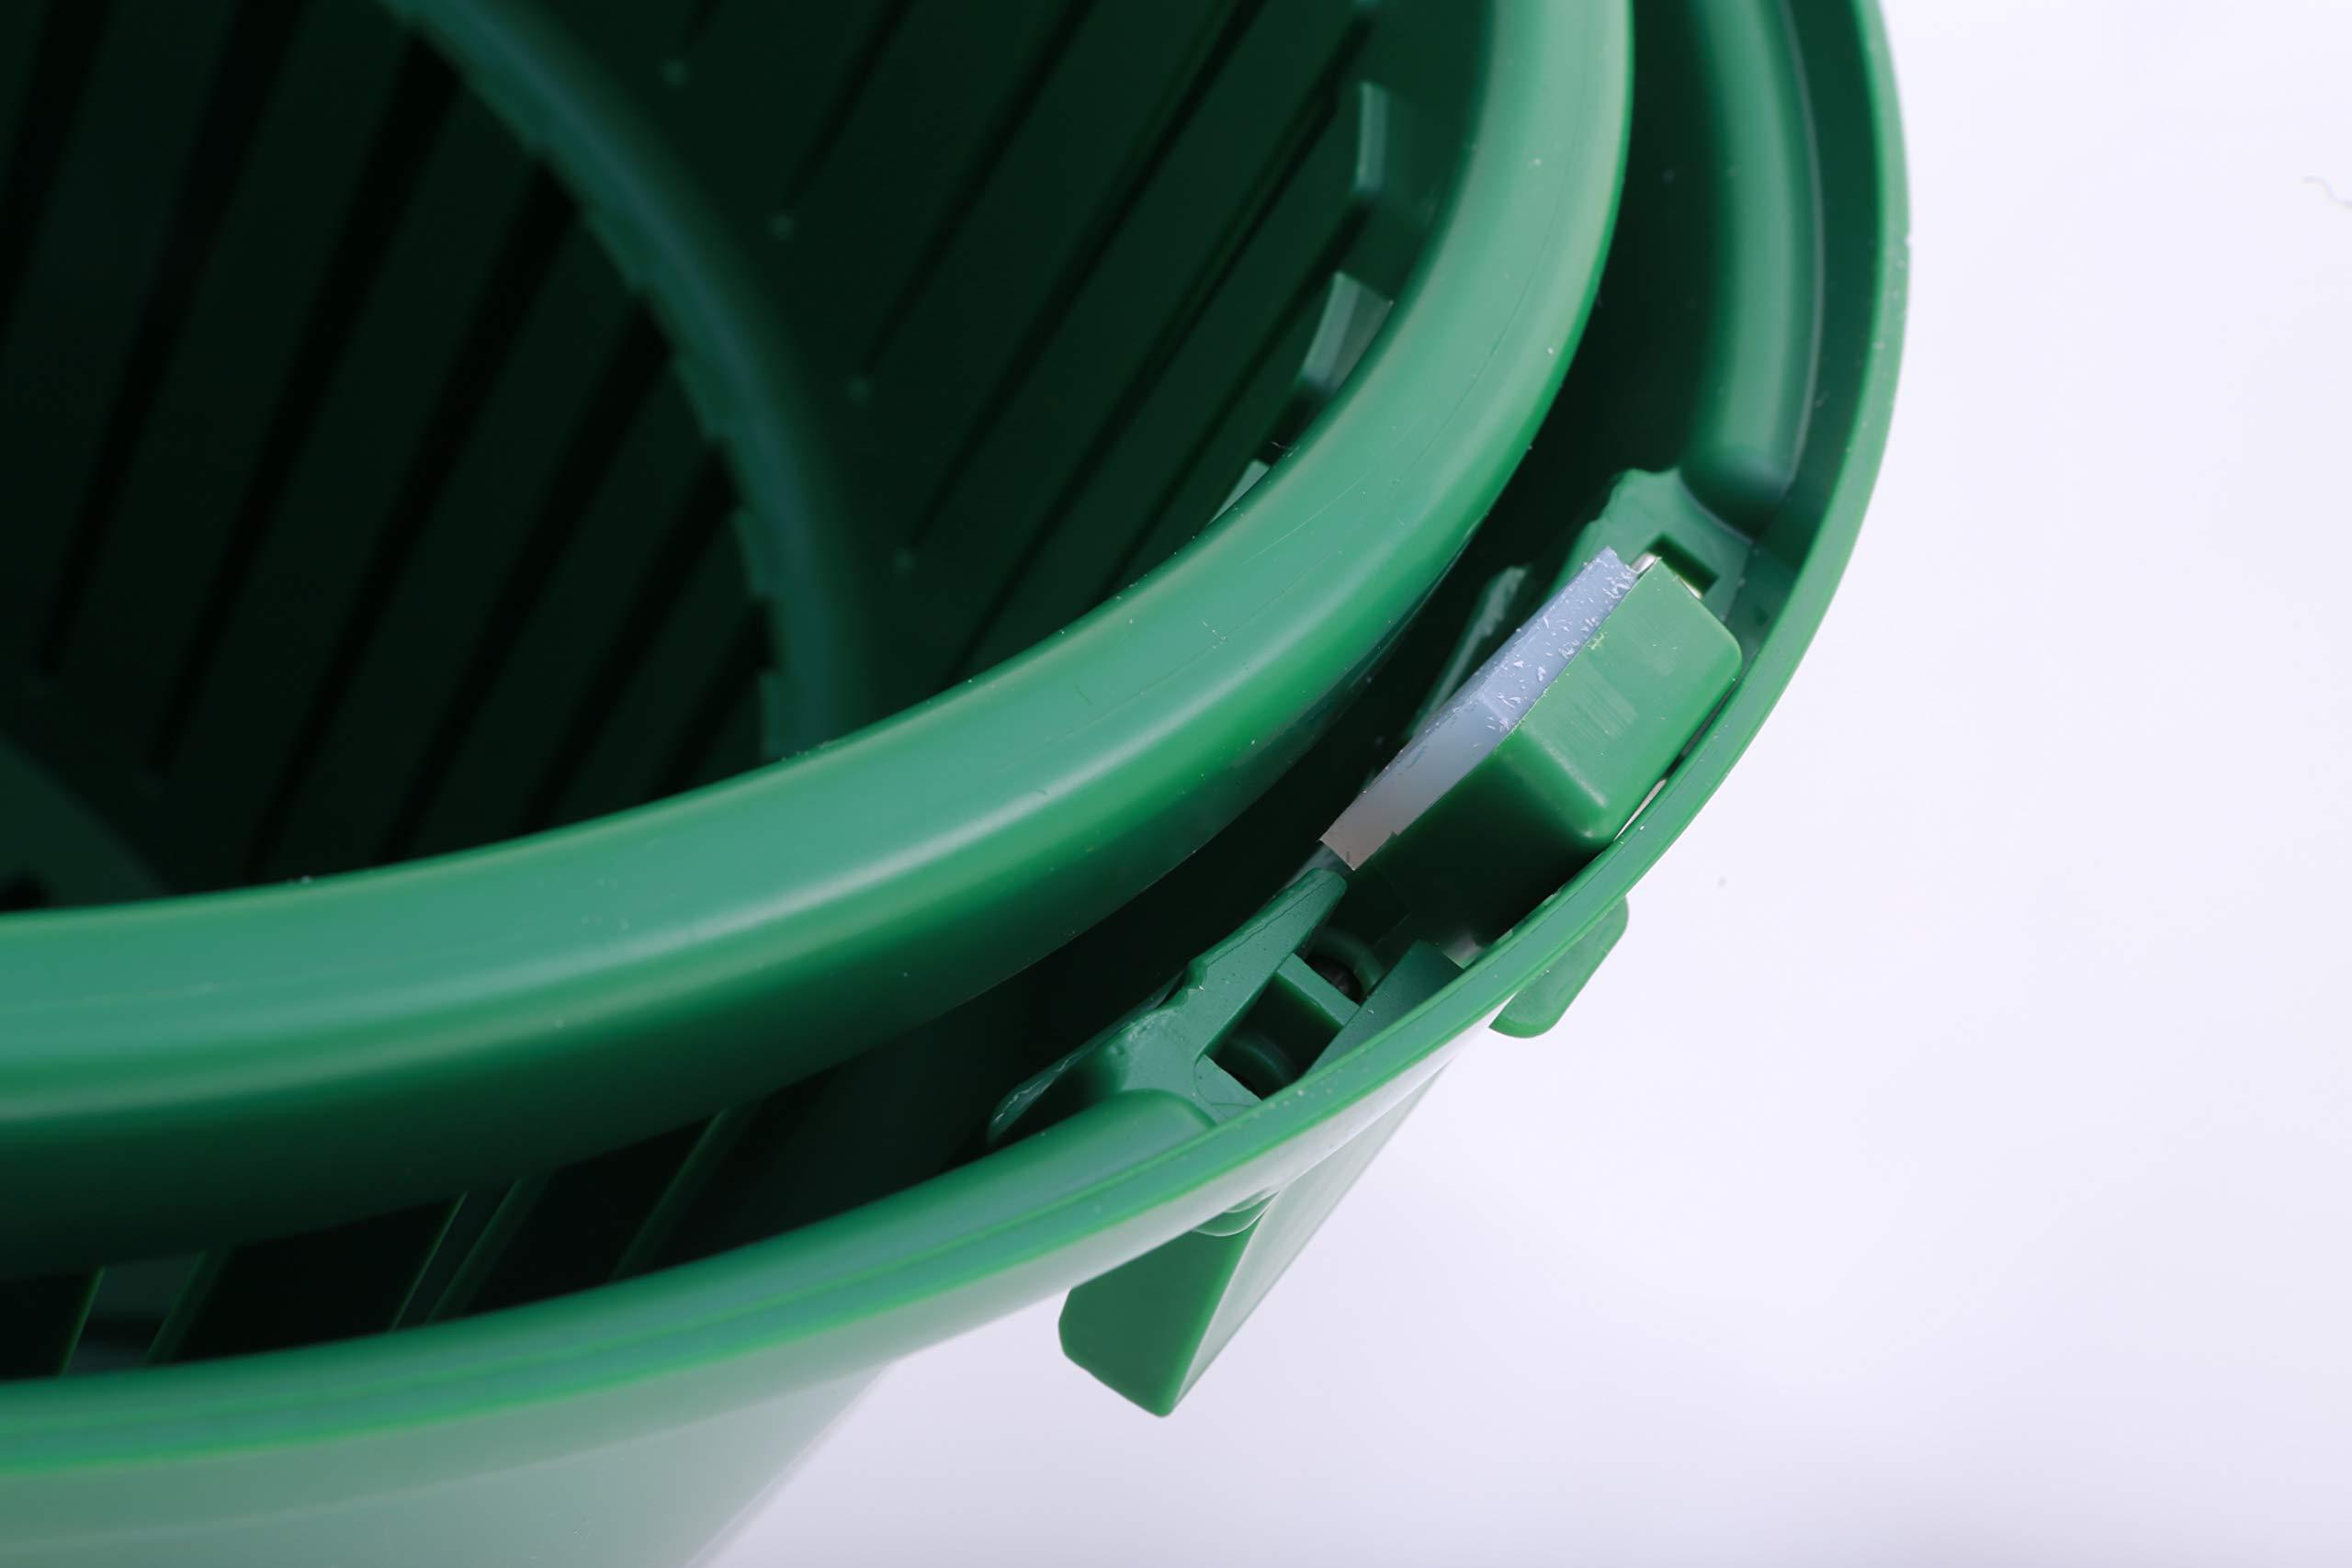 Hakka 20 Liter/5 Gallon Large Commercial Manual Salad Spinner&Dryer by HAKKA FOOD PROCESSING (Image #5)